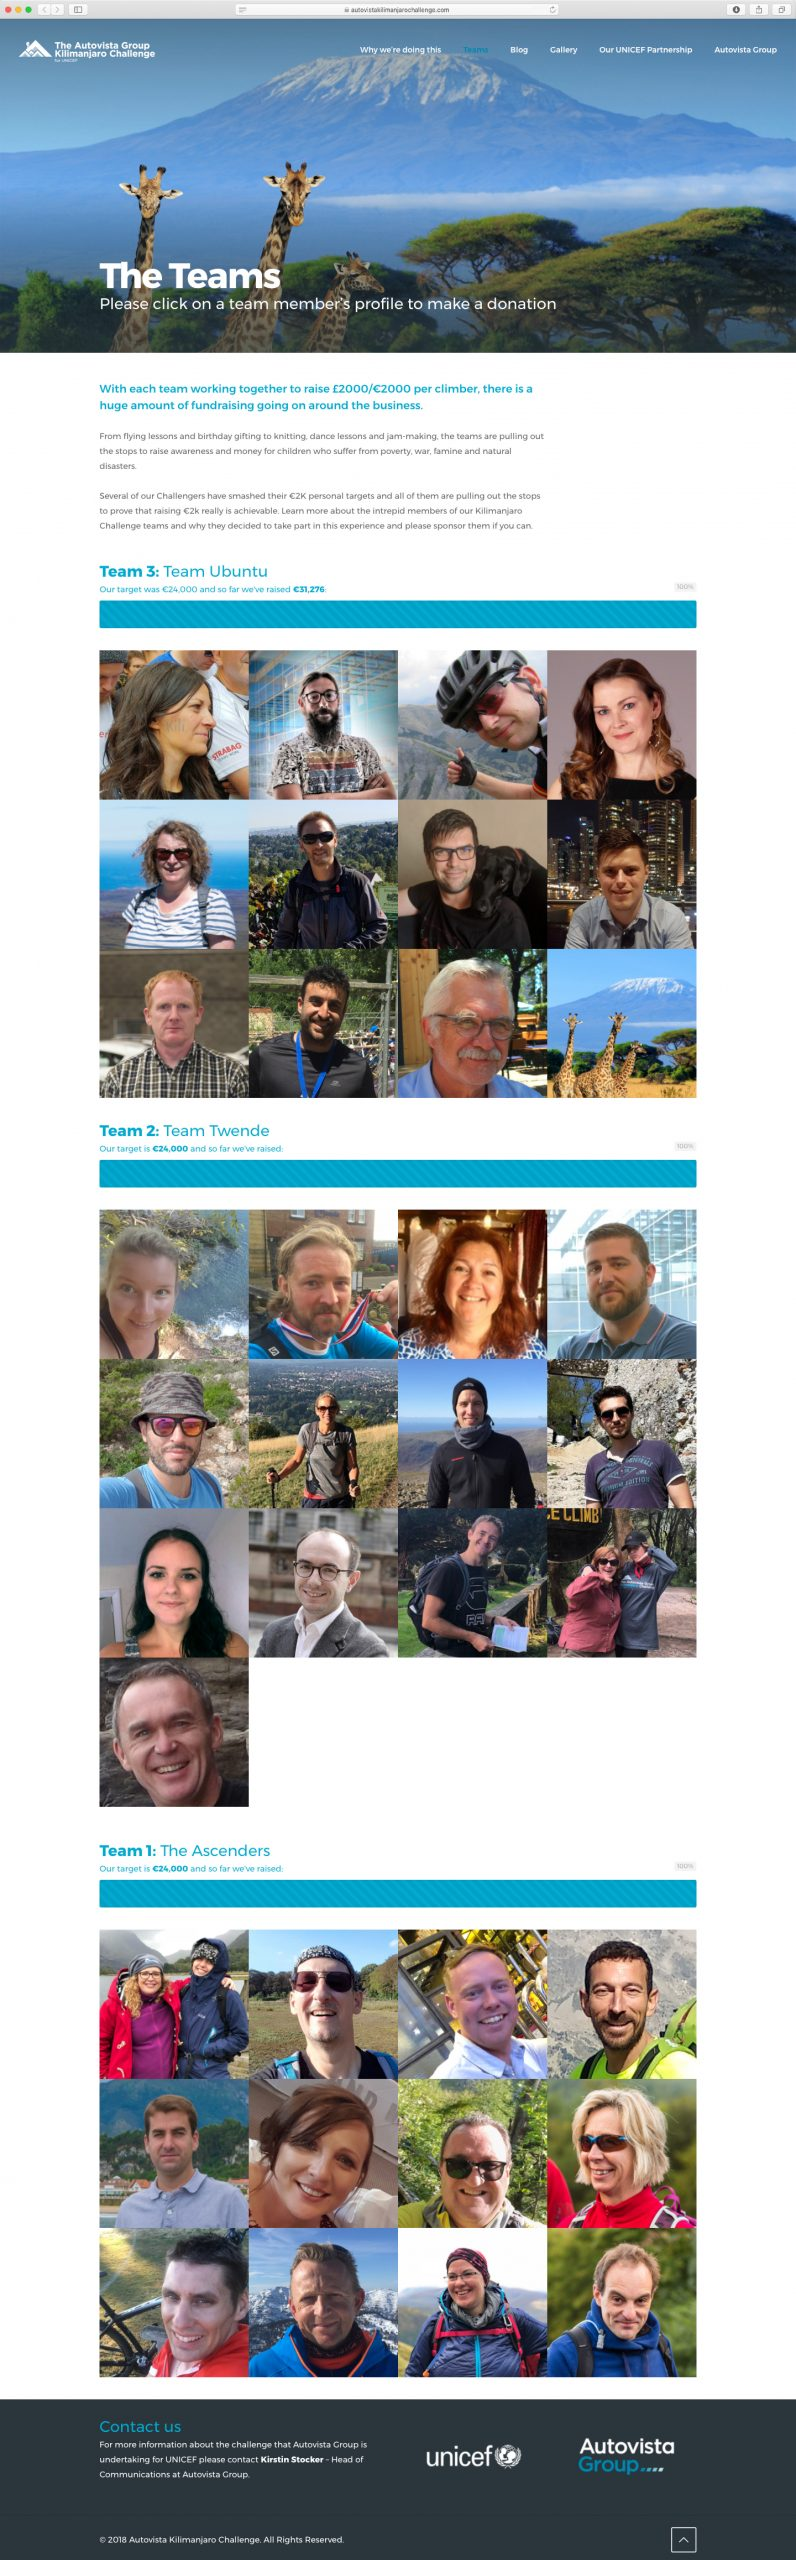 Kilimanjaro–Website3